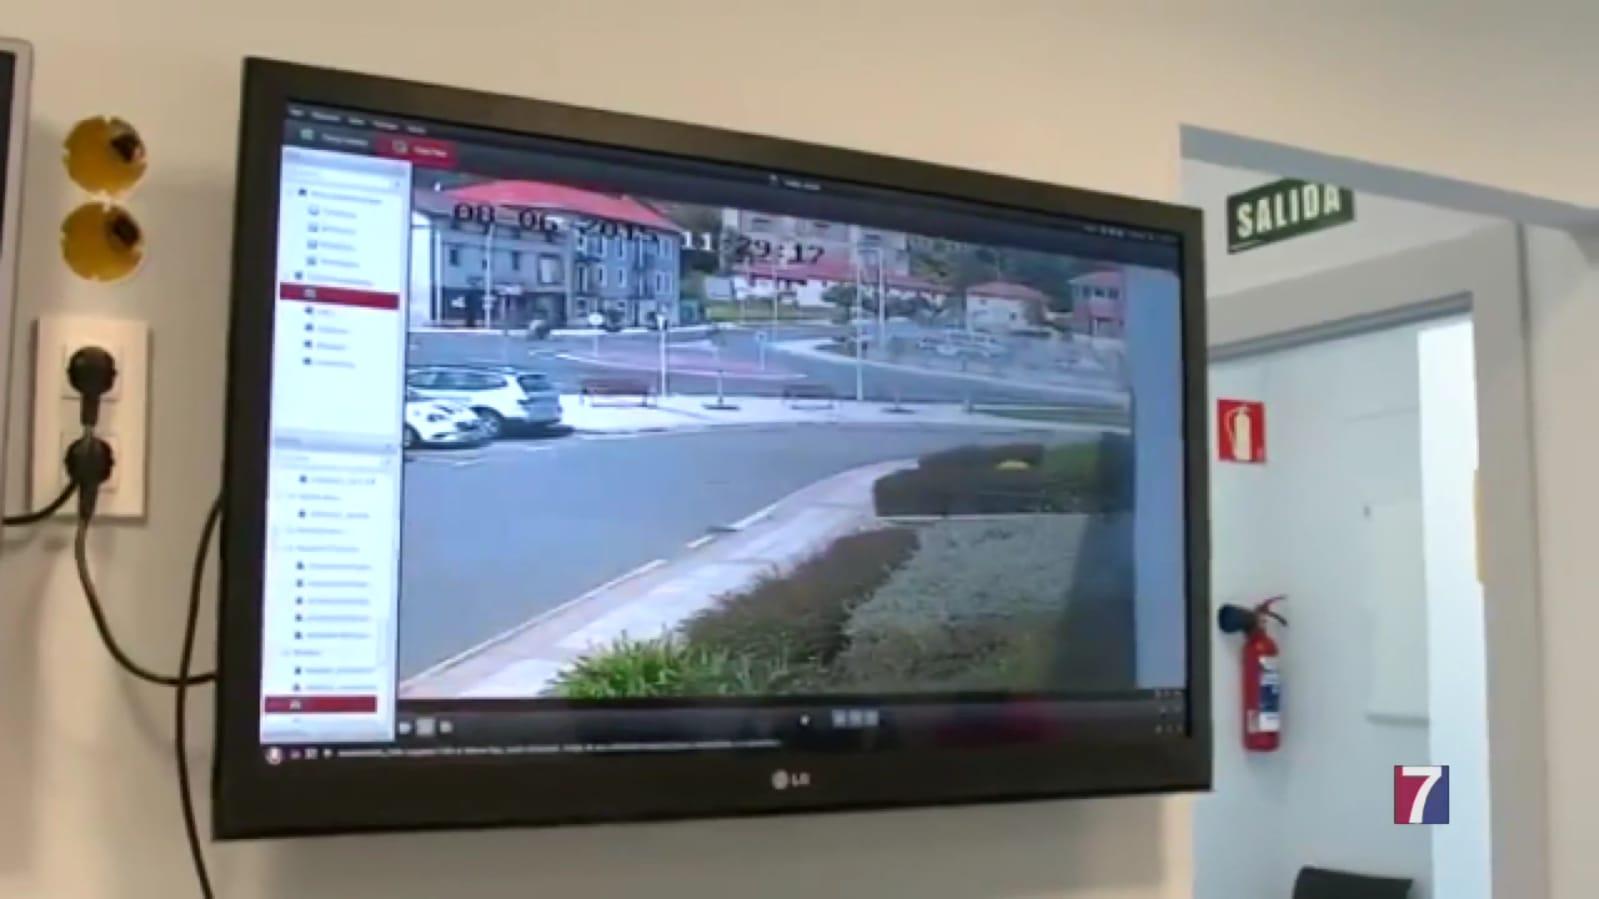 Muskiz extenderá la red wifi municipal gratuita a los barrios